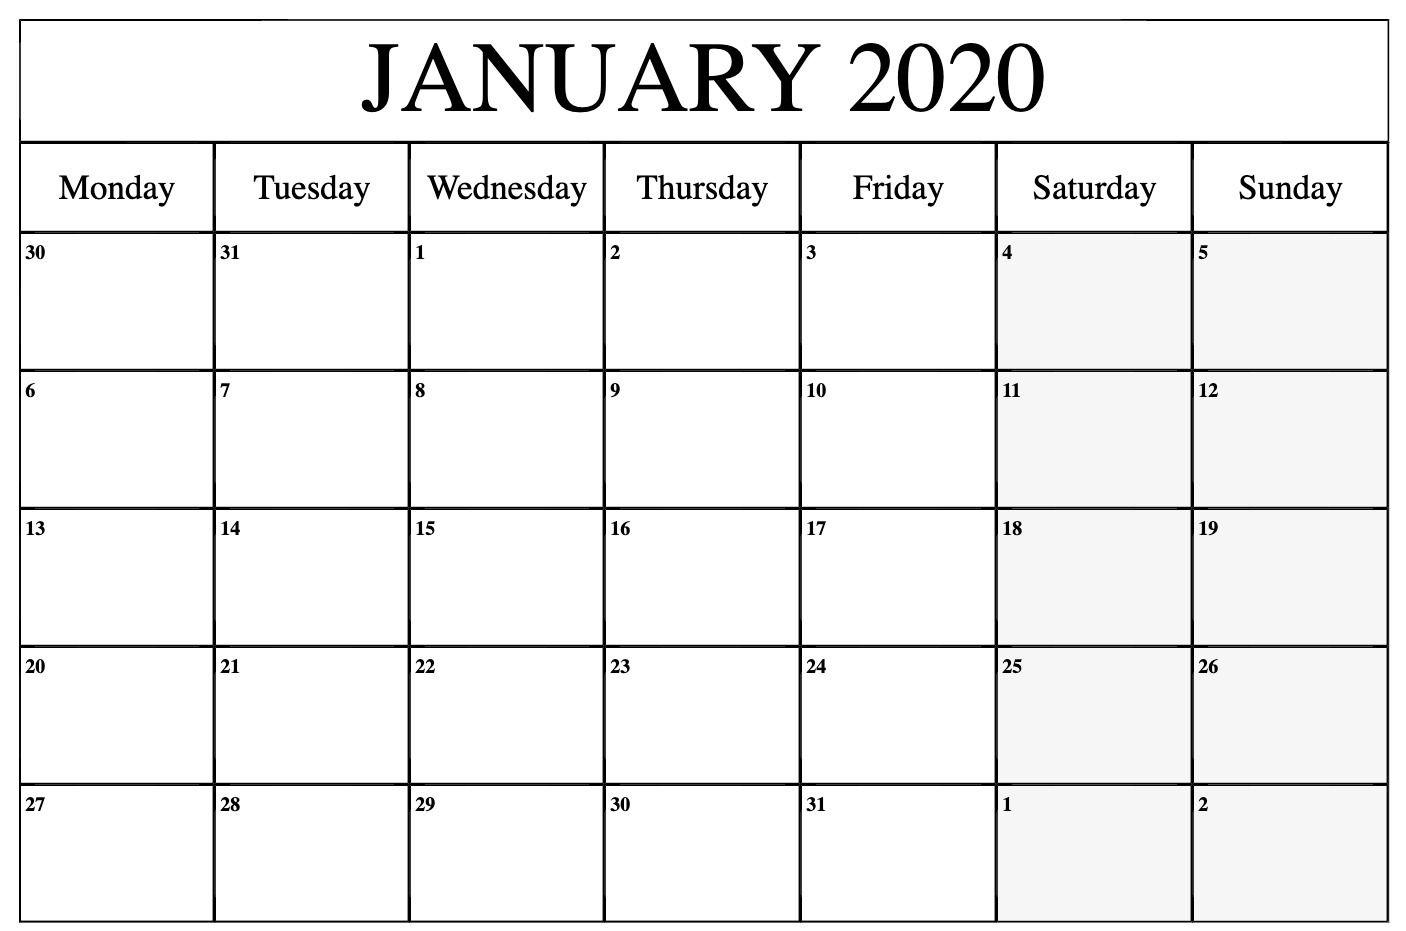 January 2020 Calendar Printable Monday   Free Printable for 2020 Printable Calendar Sunday To Saturday